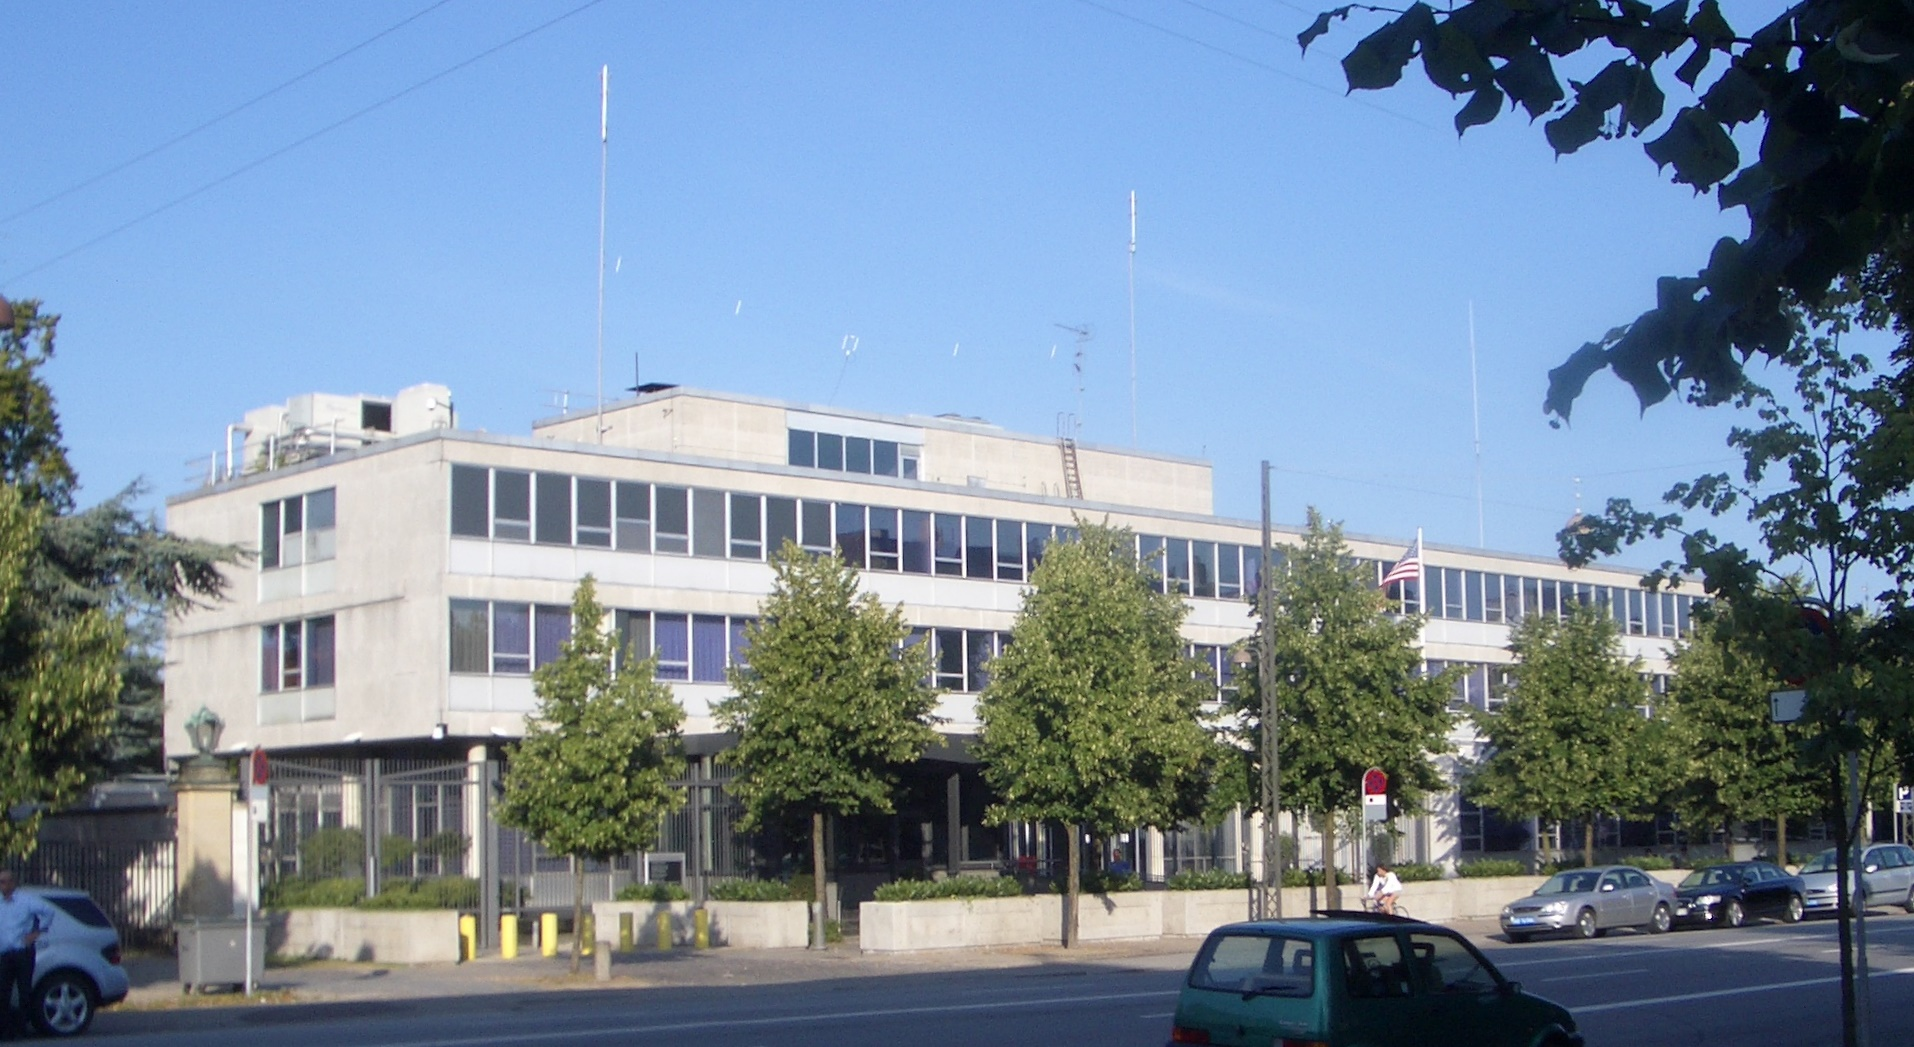 File:Den amerikanske ambassade i København.JPG - Wikimedia Commons